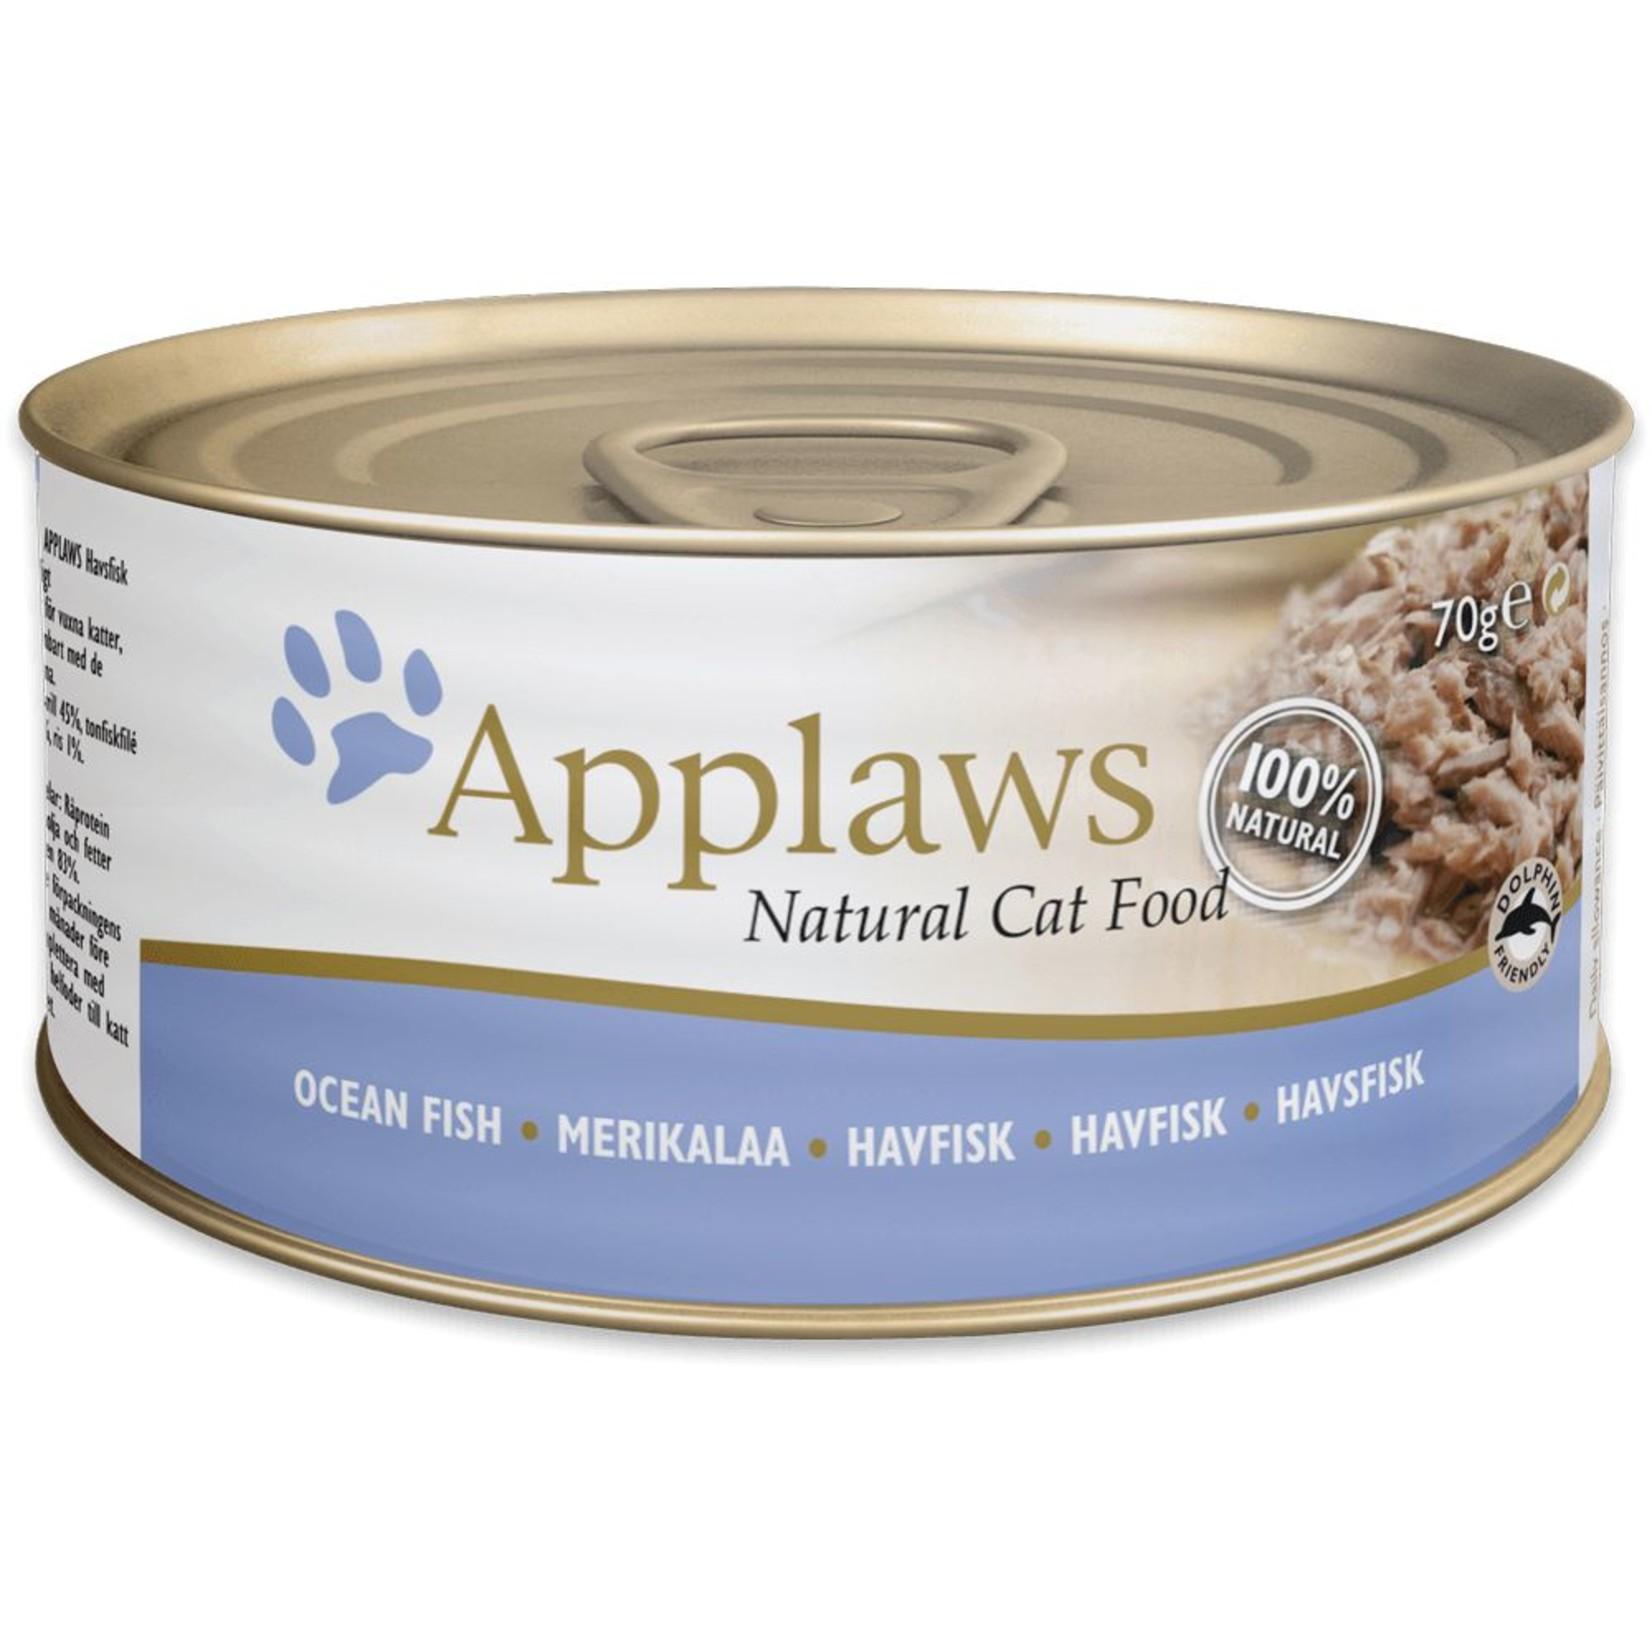 Applaws Cat Wet Food Ocean Fish, 156g